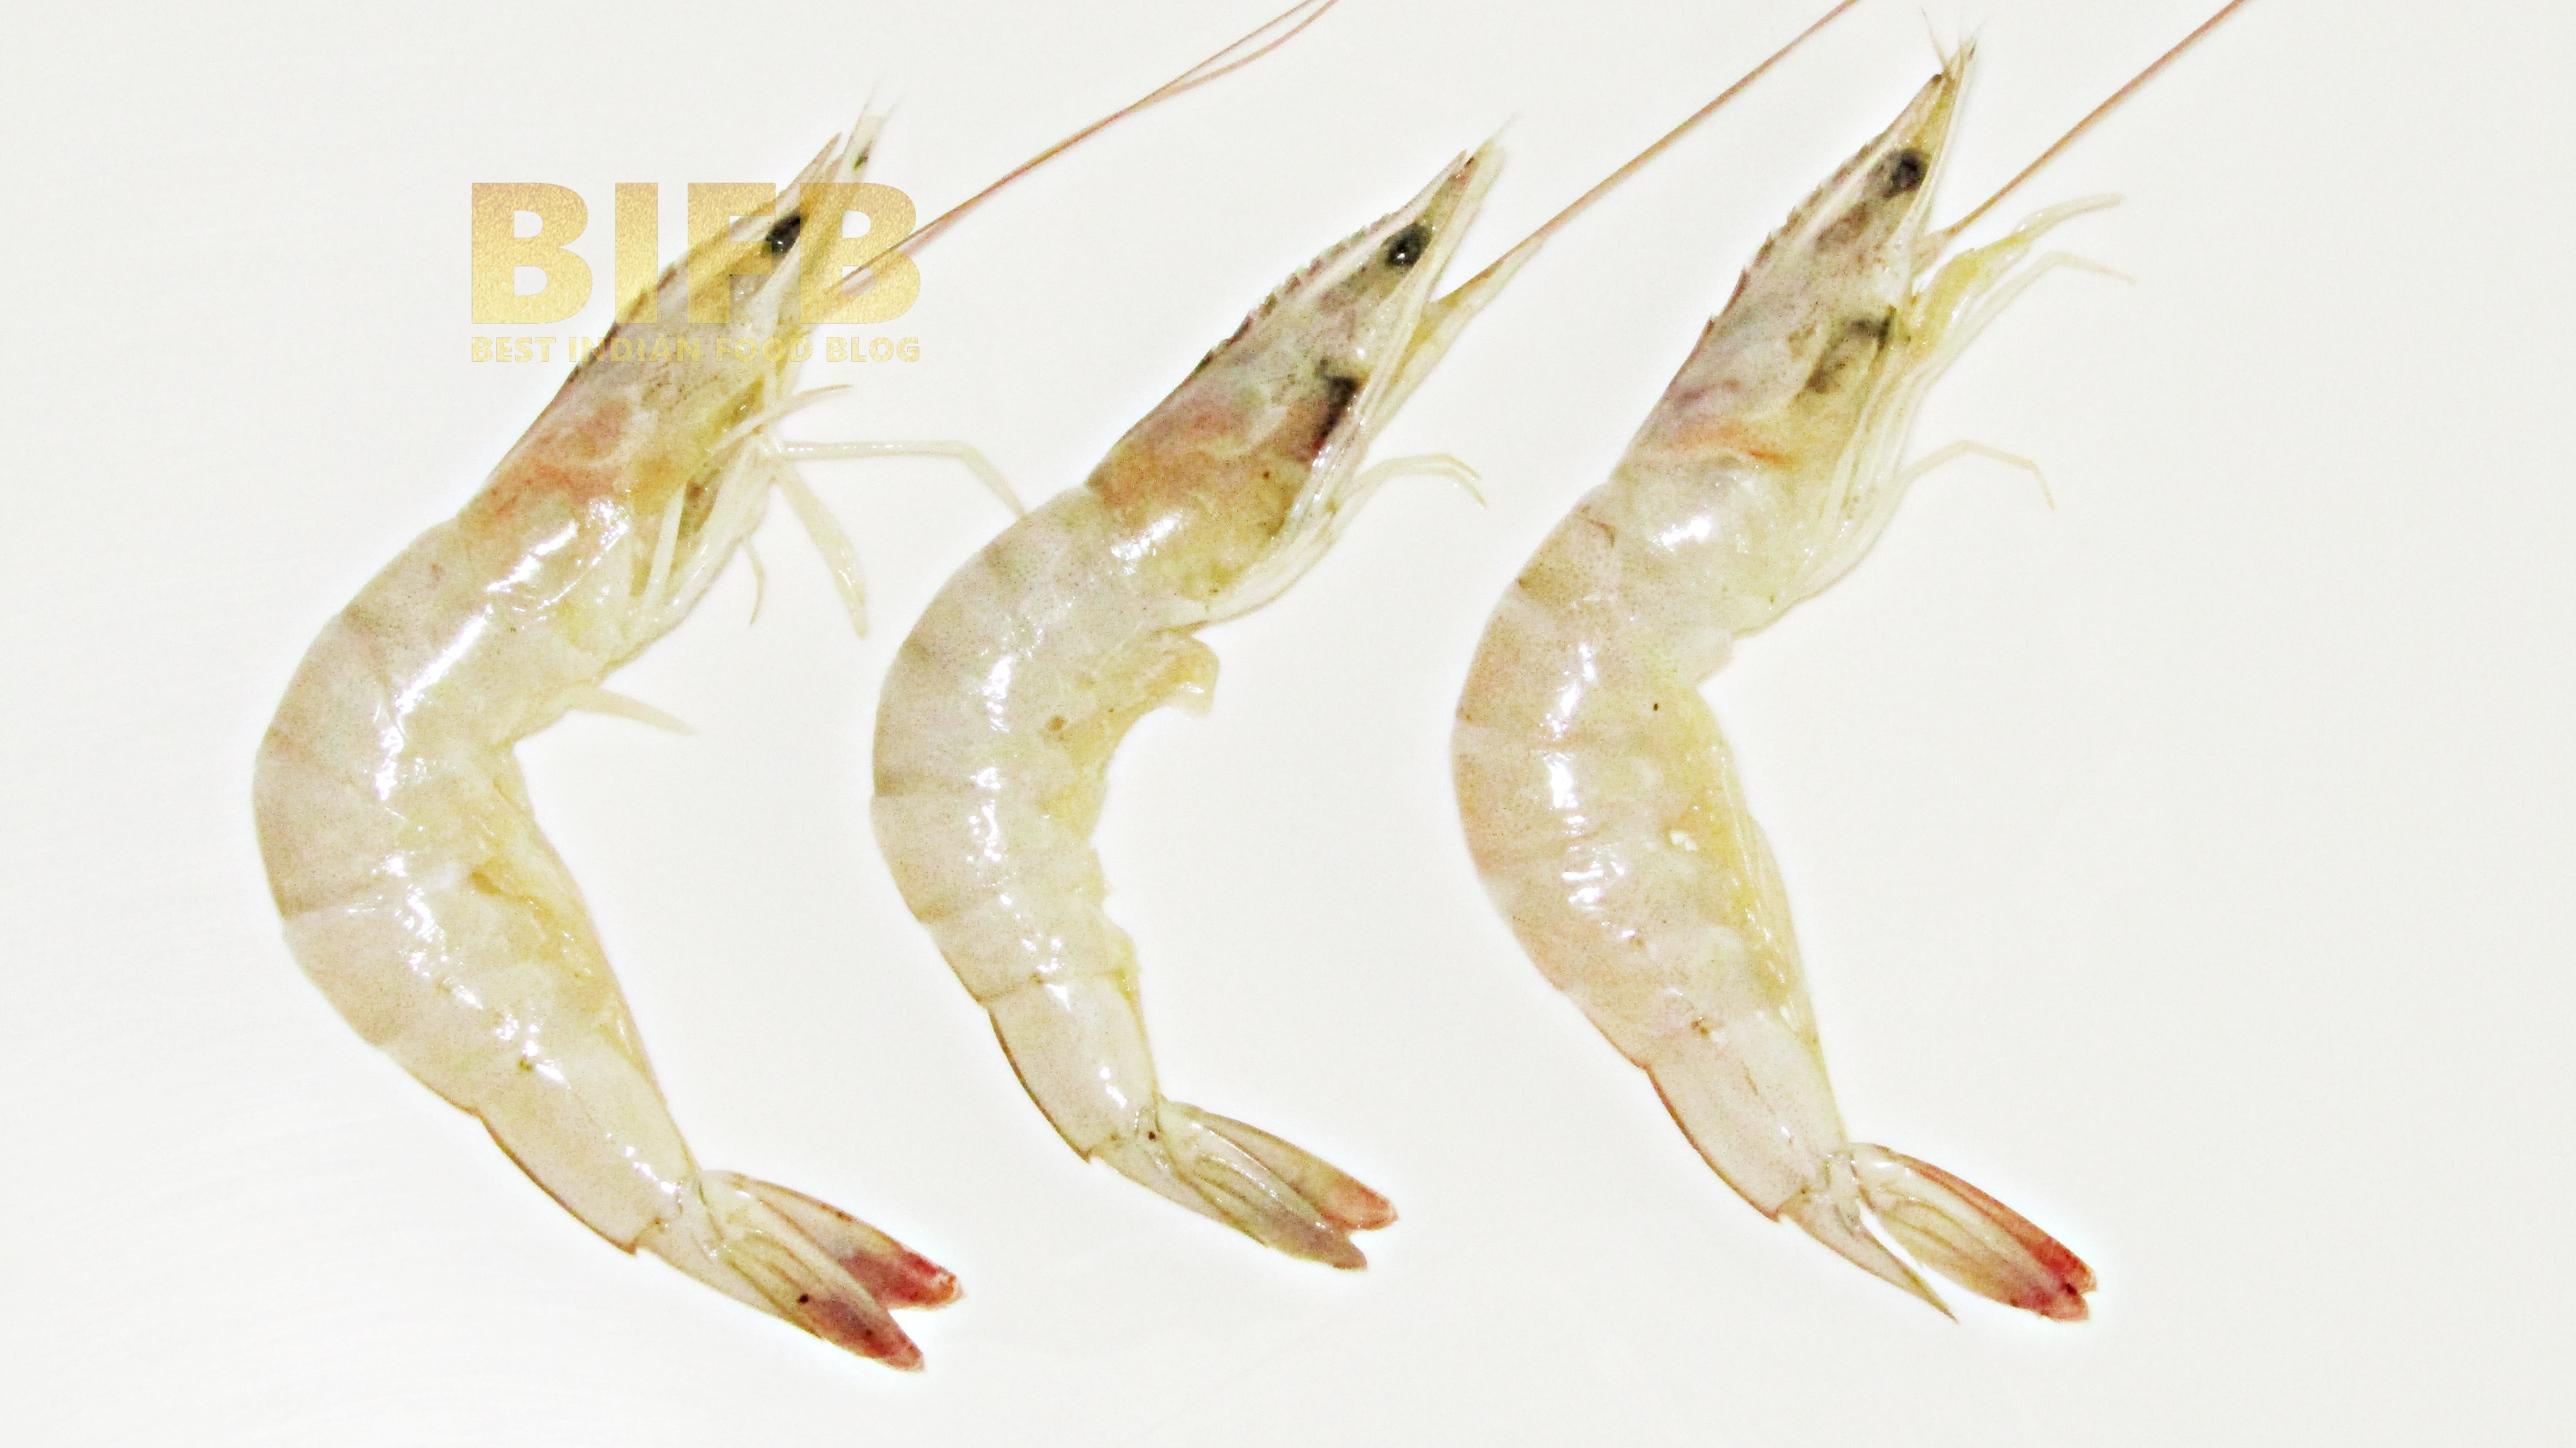 Prawn Fish, Jhinga Machli, Chingri Mach